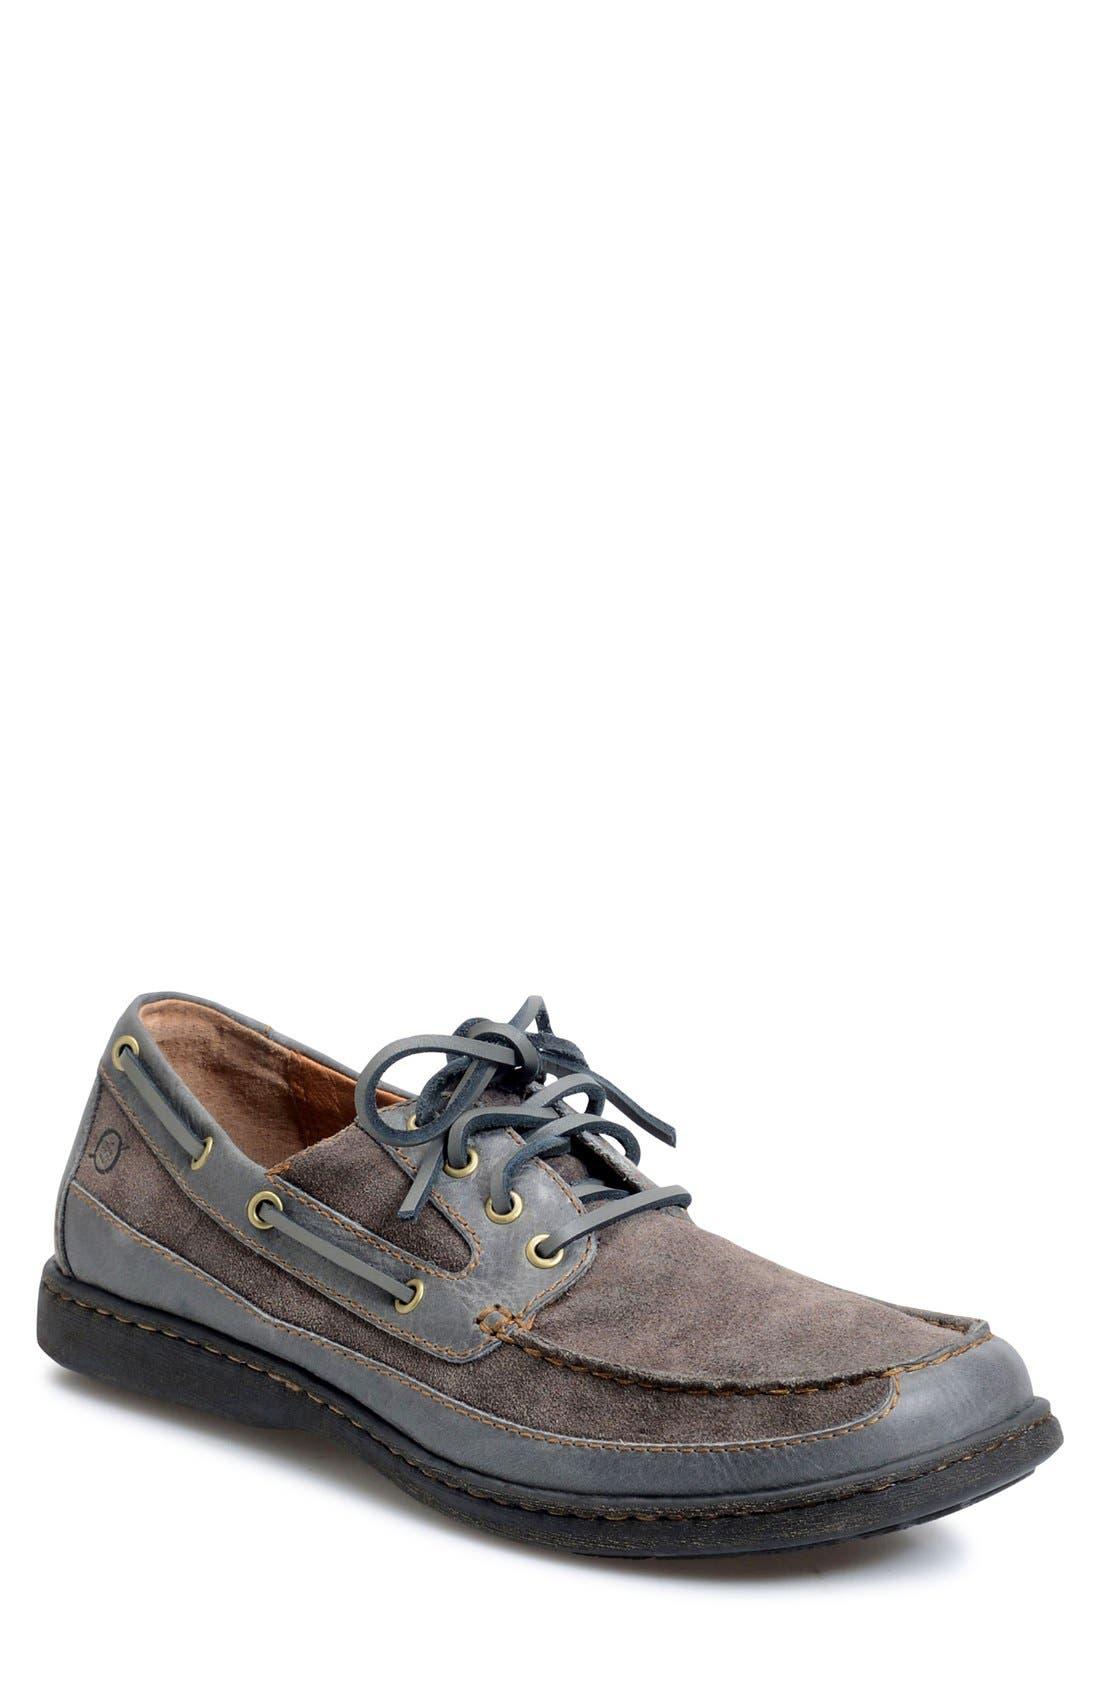 'Harwich' Boat Shoe,                         Main,                         color,